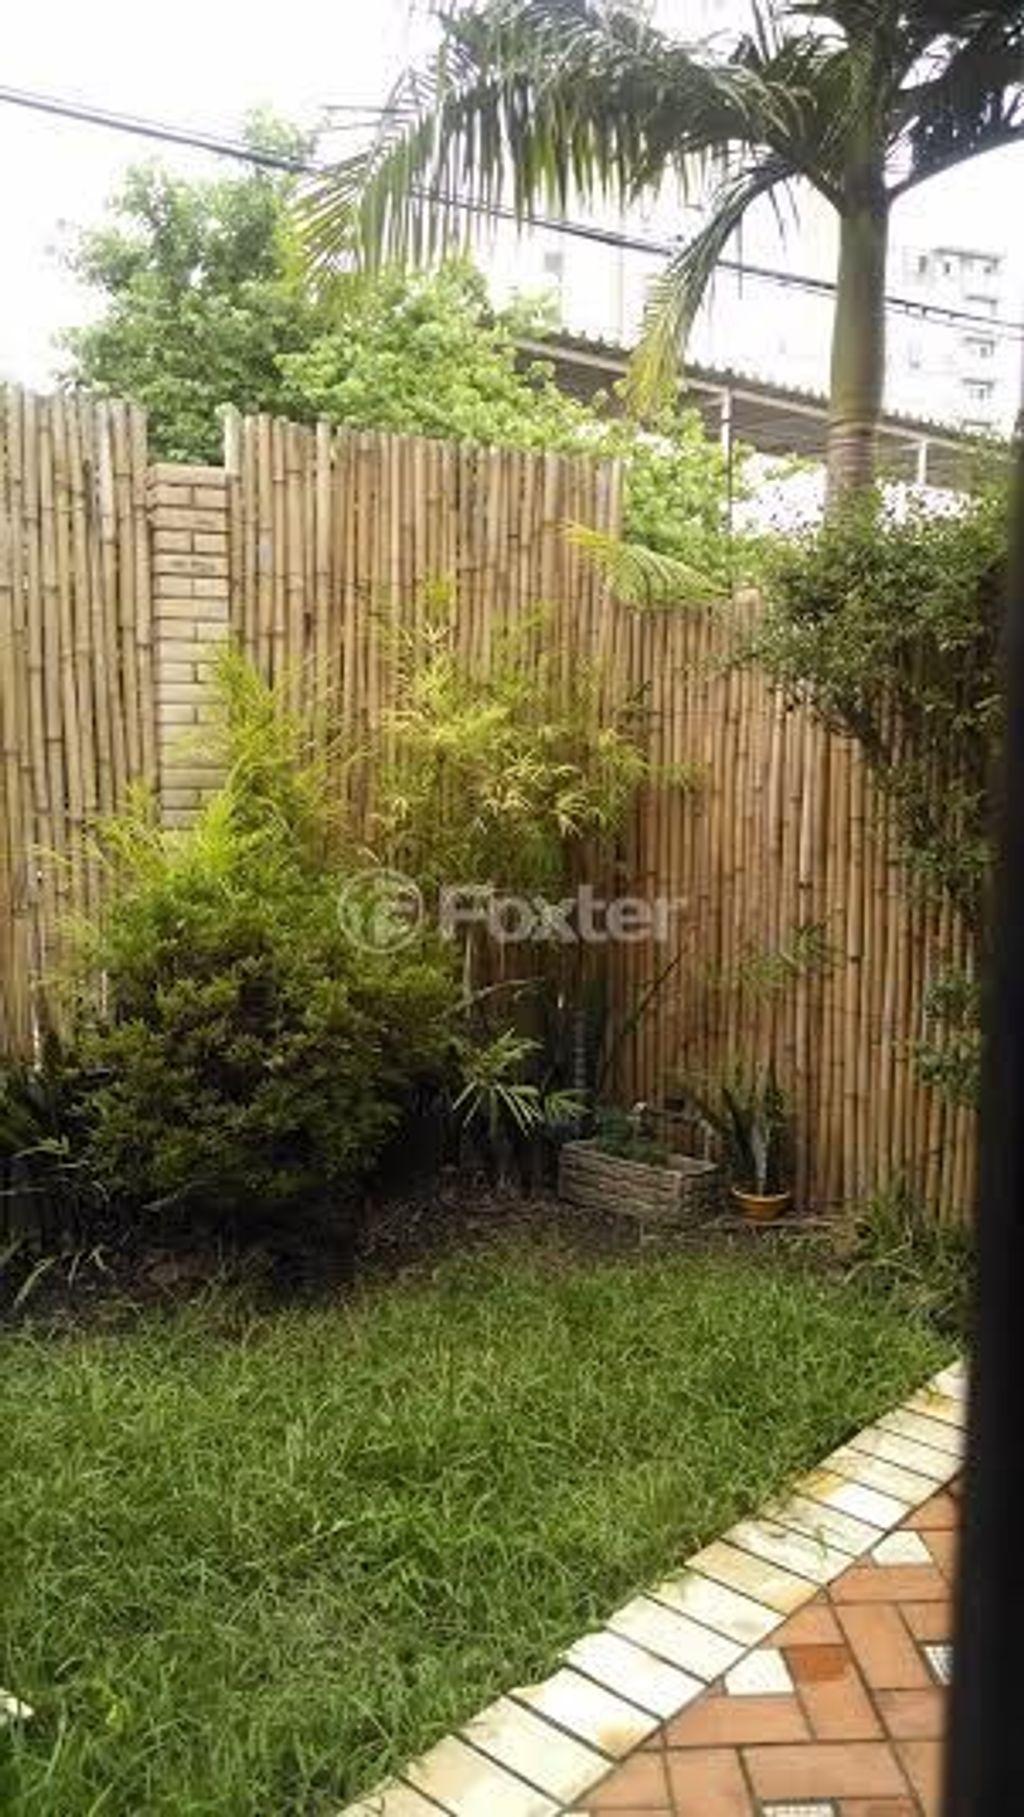 Casa 3 Dorm, Jardim Itu Sabará, Porto Alegre (5388) - Foto 34